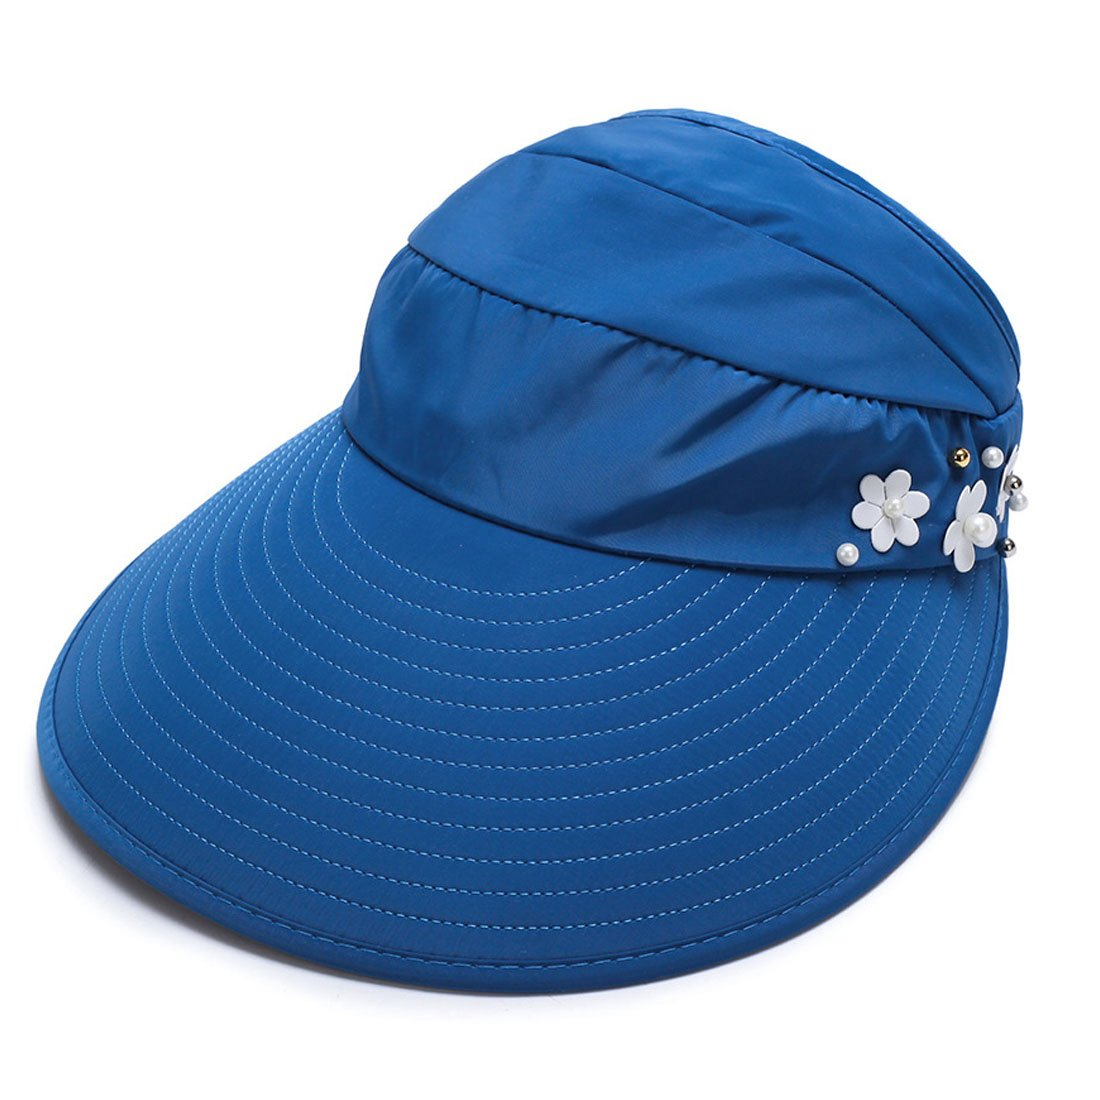 King Star UPF 50+ Womens Foldable Wide Large Big Brim Beach Visor Cap Summer Sun Hat Mid Blue